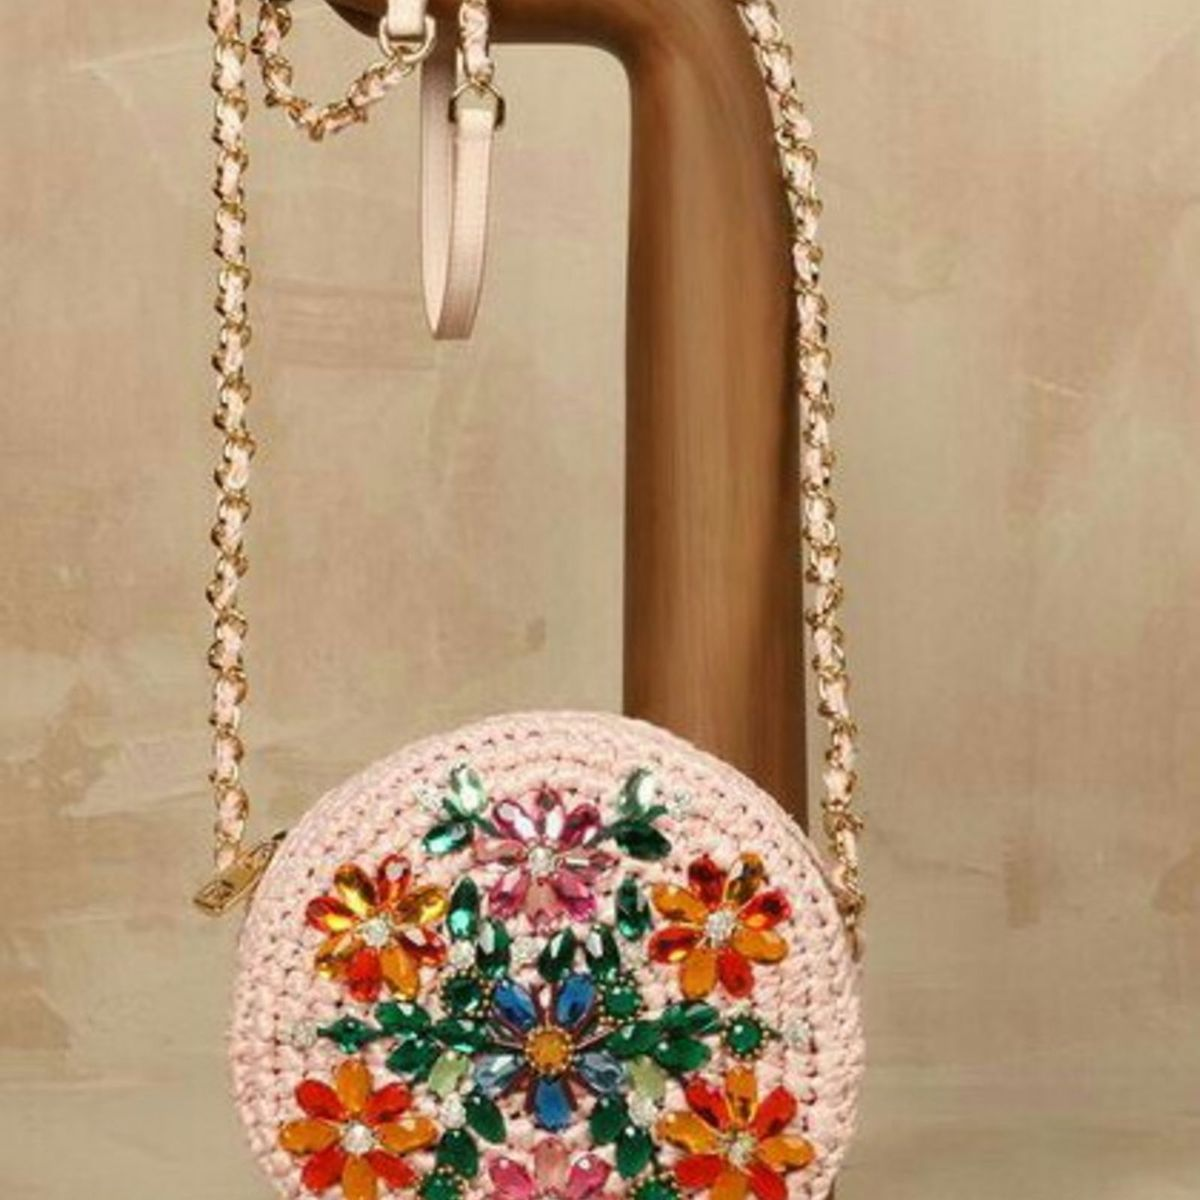 1e8e67415 Bolsa Redonda Crochê Bordada | Clutch Feminina Love Boho Shop Nunca Usado  19962655 | enjoei